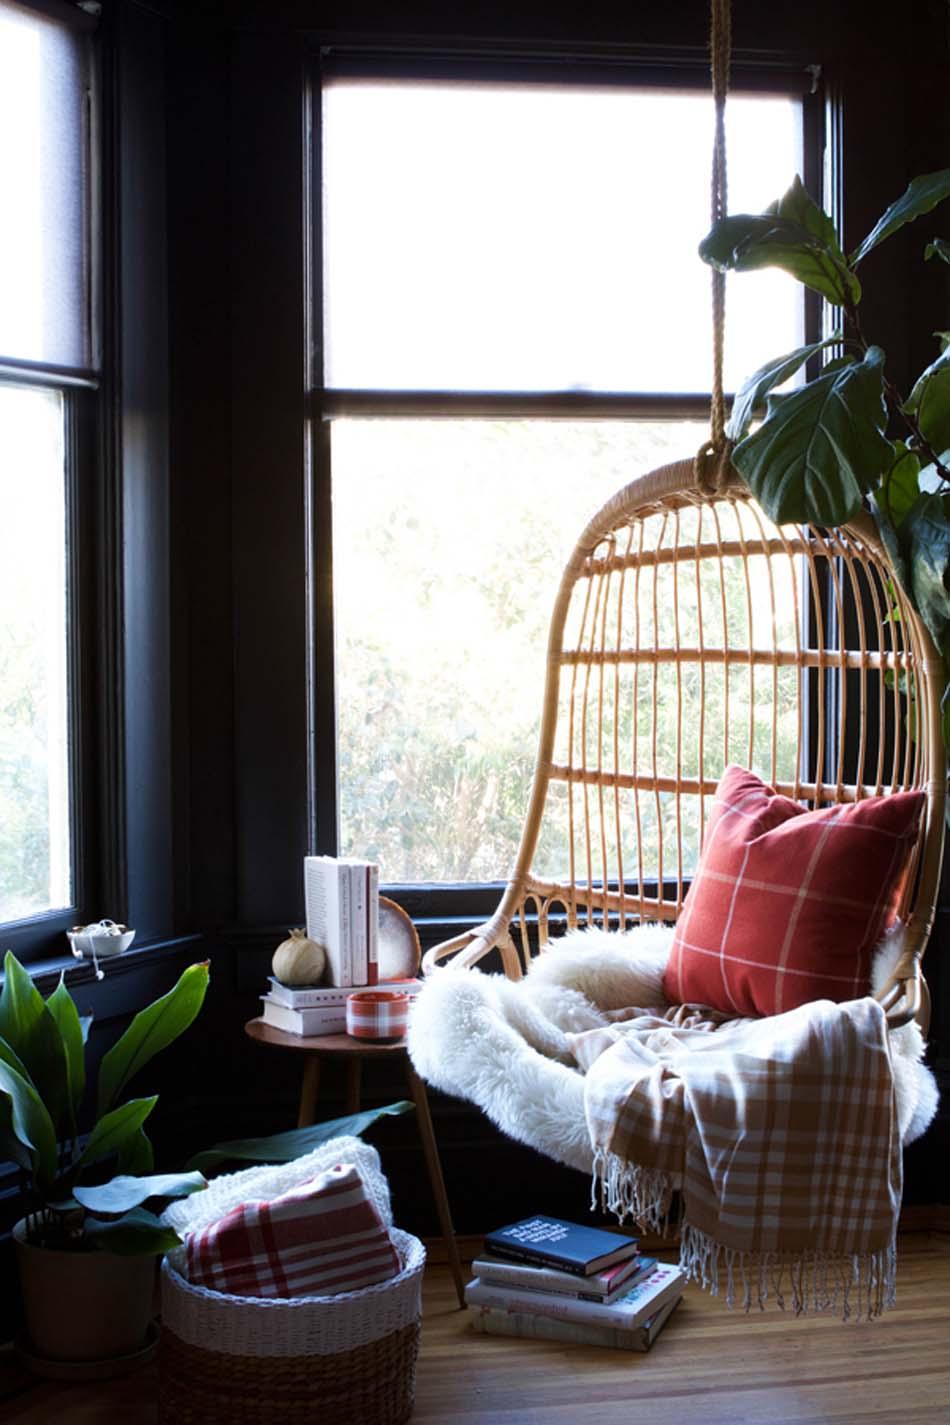 18 Unique Reading Nook Design Ideas - Style Motivation on Nook's Cranny Design Ideas  id=12649